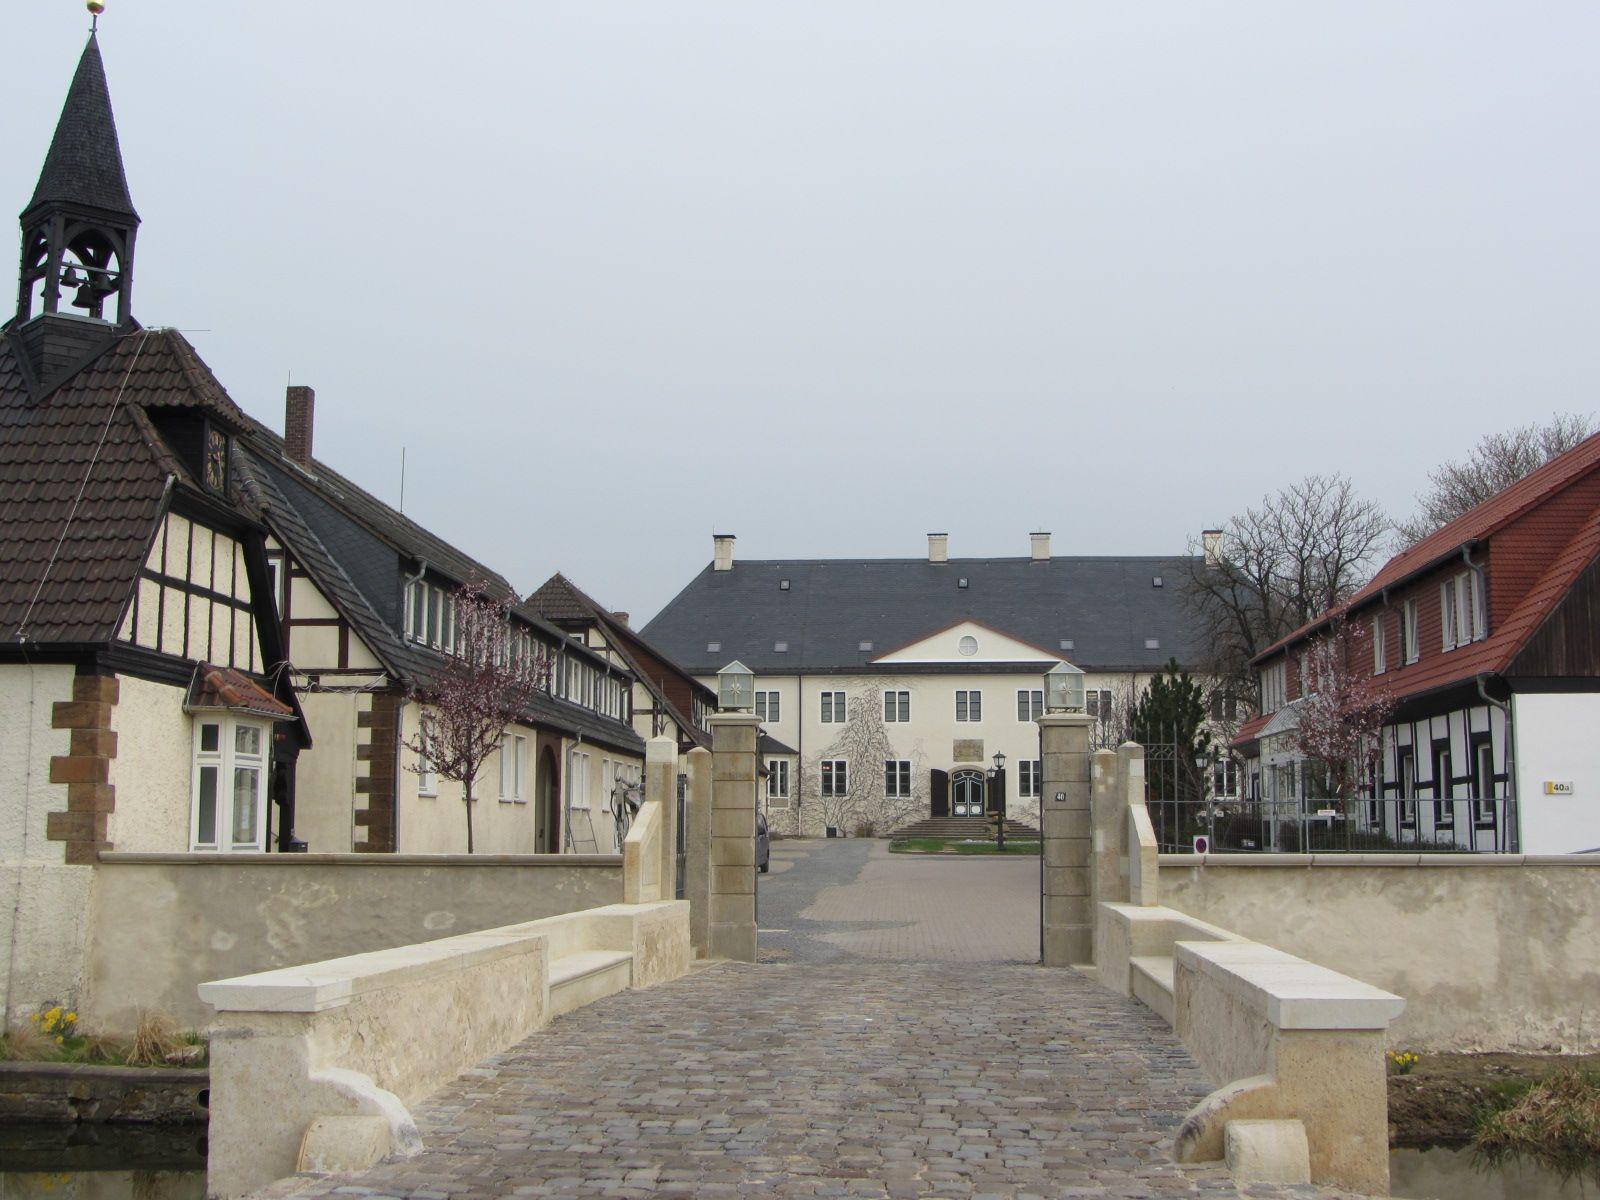 SchloГџ Benkhausen